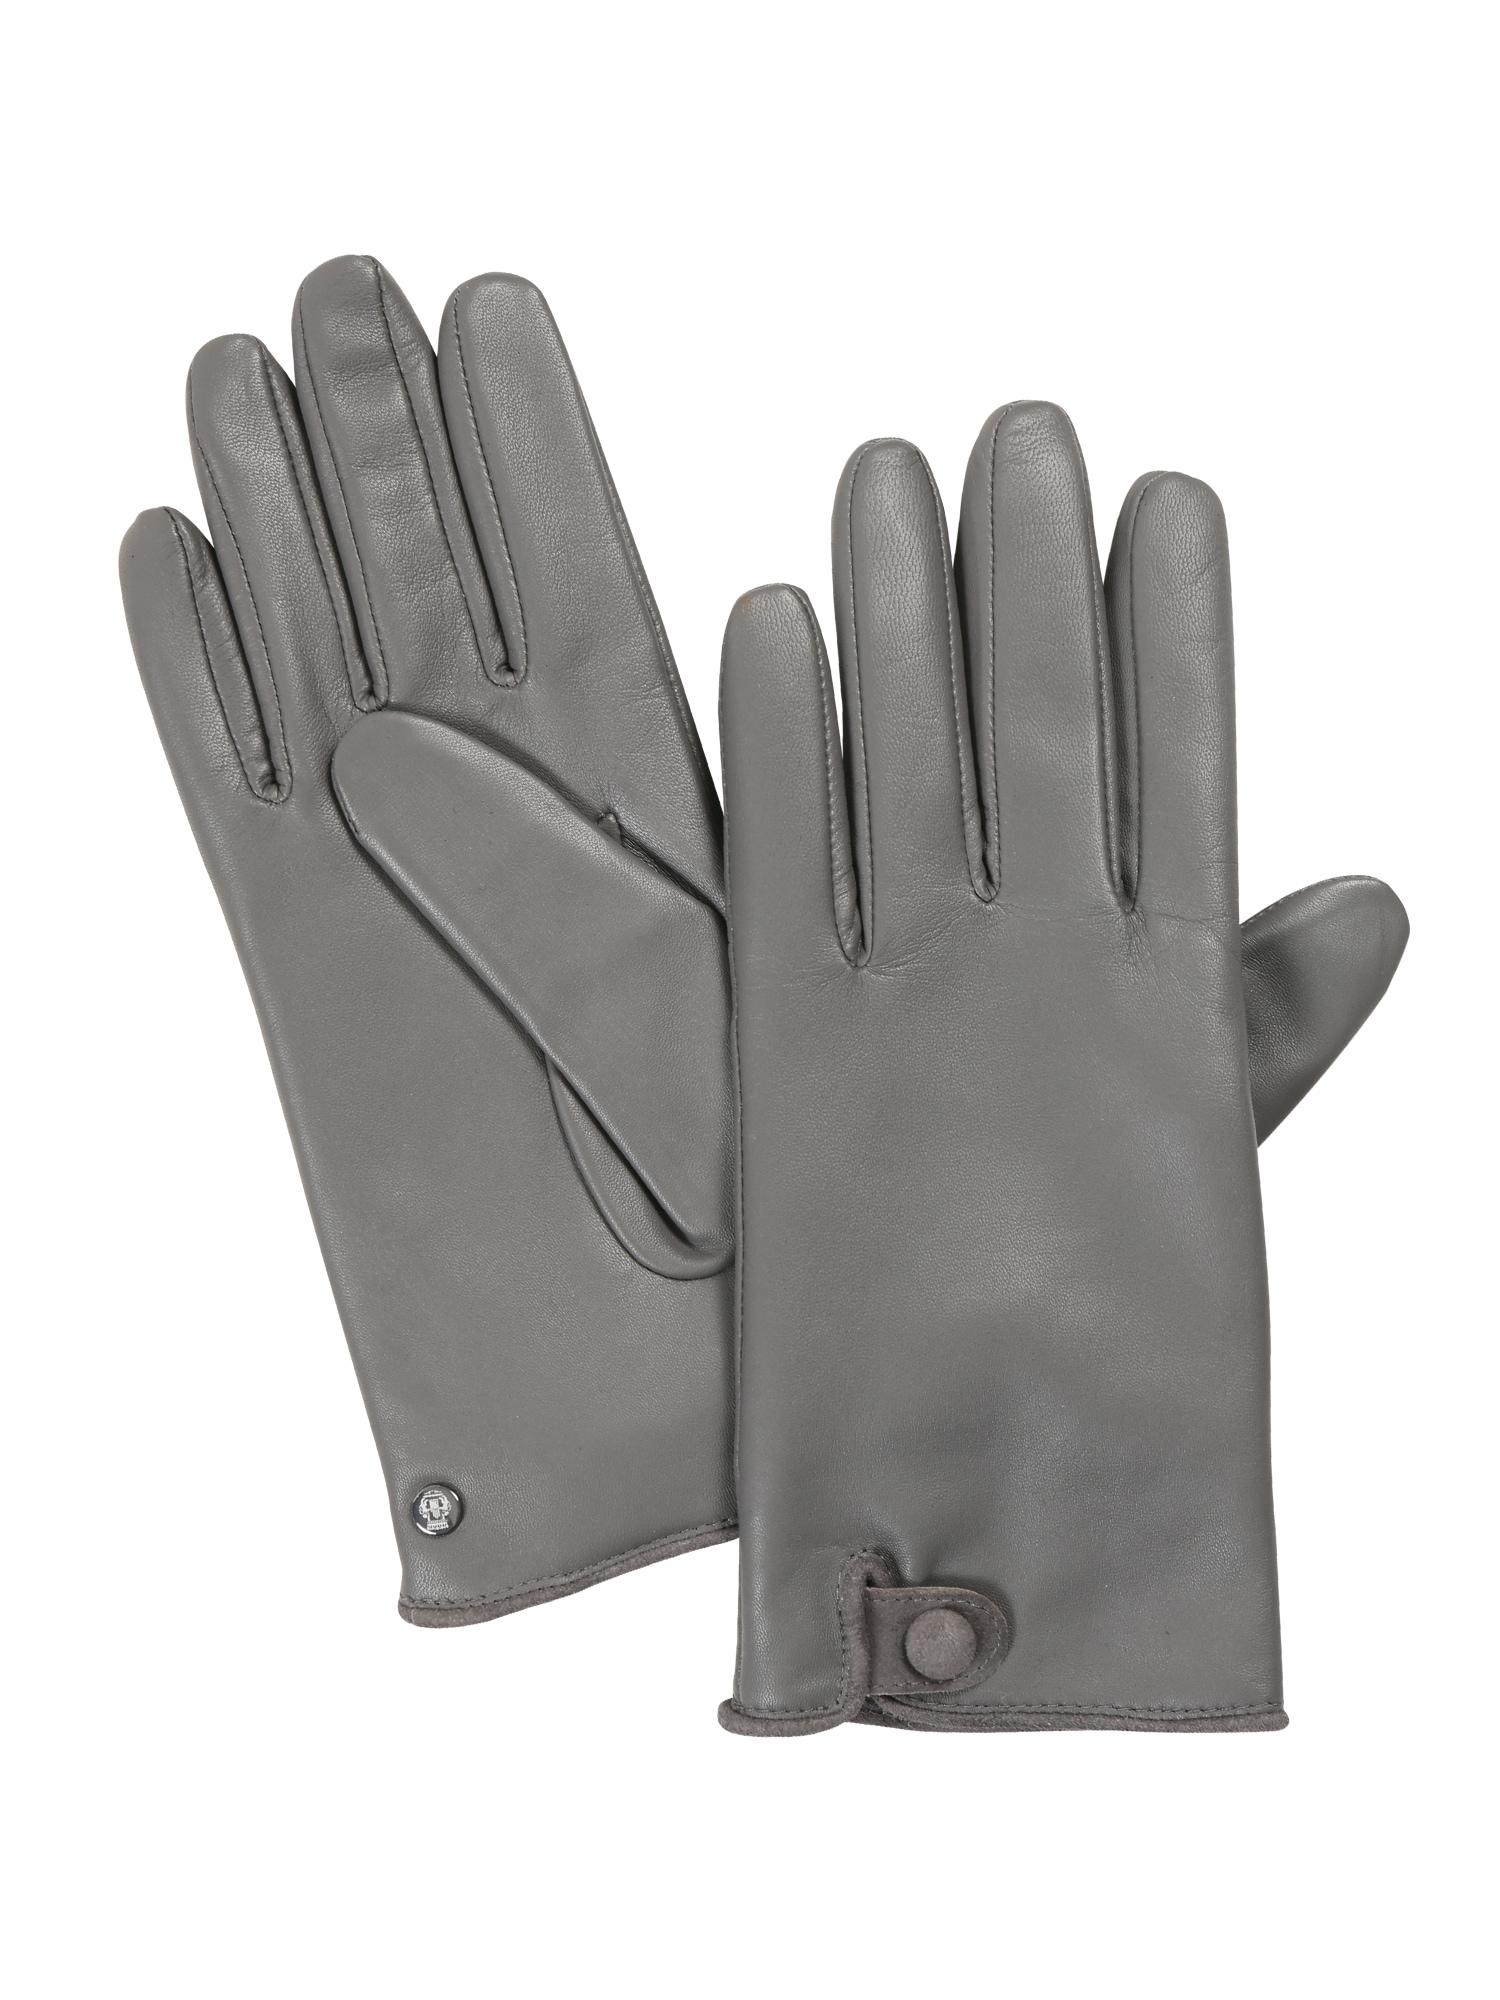 Lederhandschuhe 'Tiny Belt'   Accessoires > Handschuhe > Lederhandschuhe   ROECKL